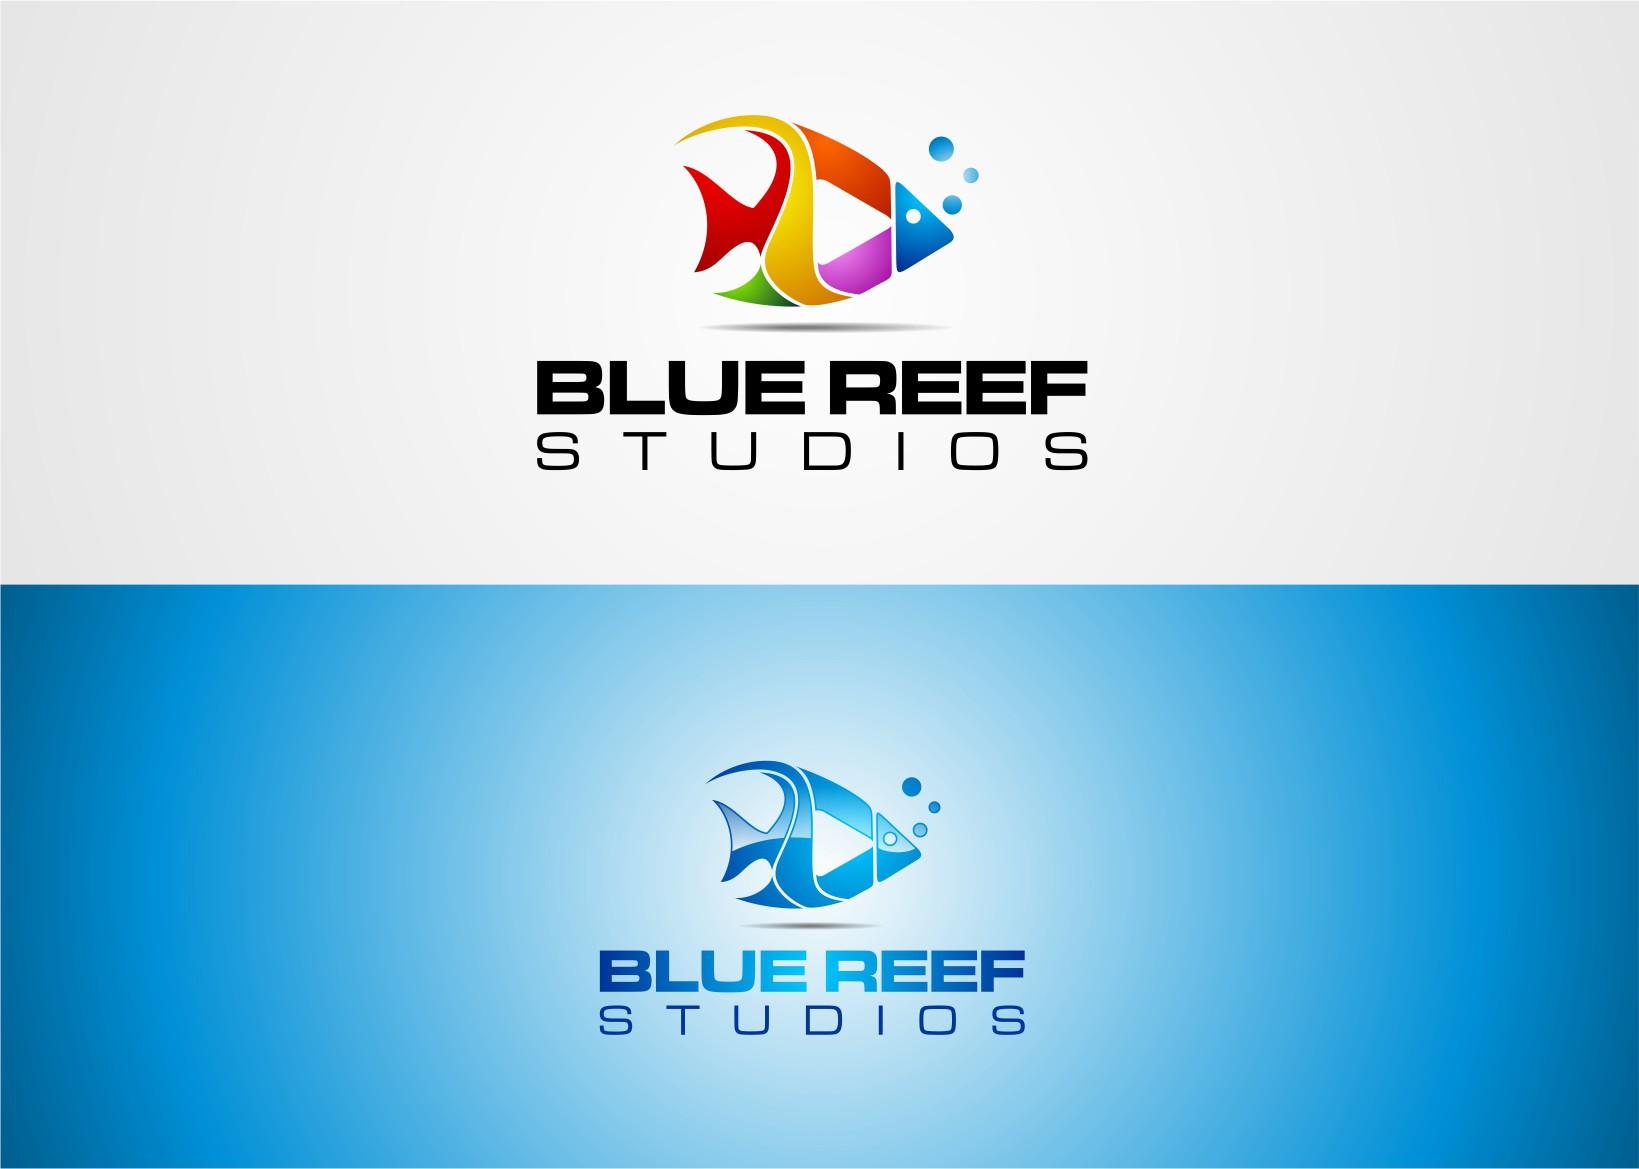 Blue Reef Studios needs a new logo